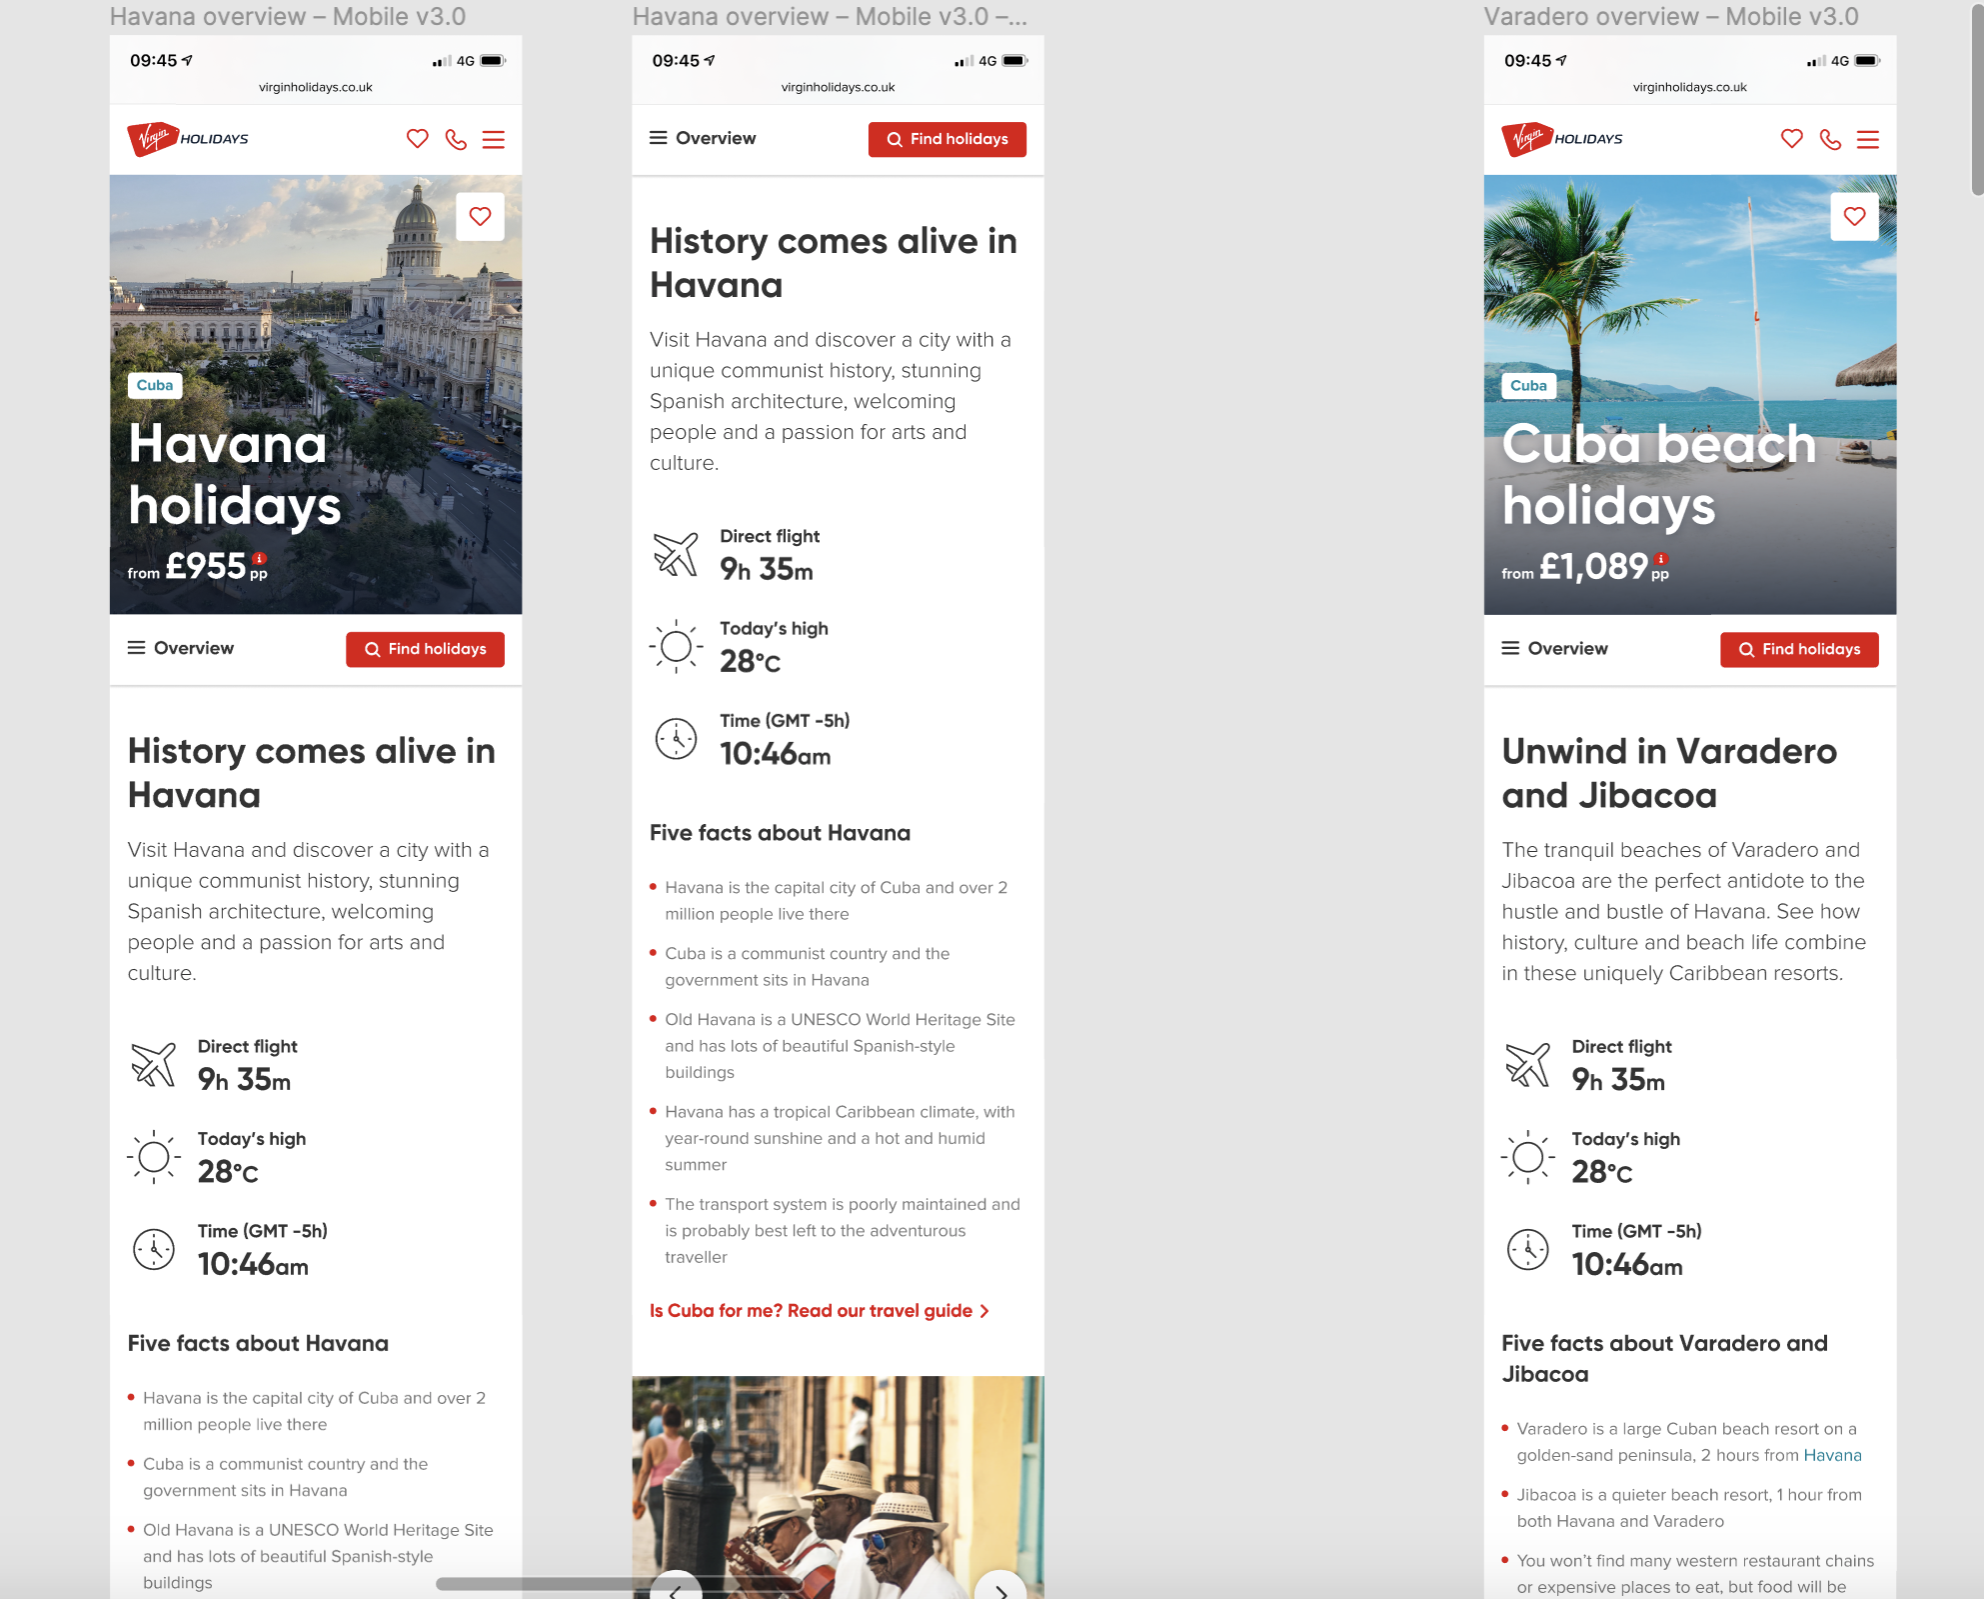 Destination content for Havana and Varadero, Cuba